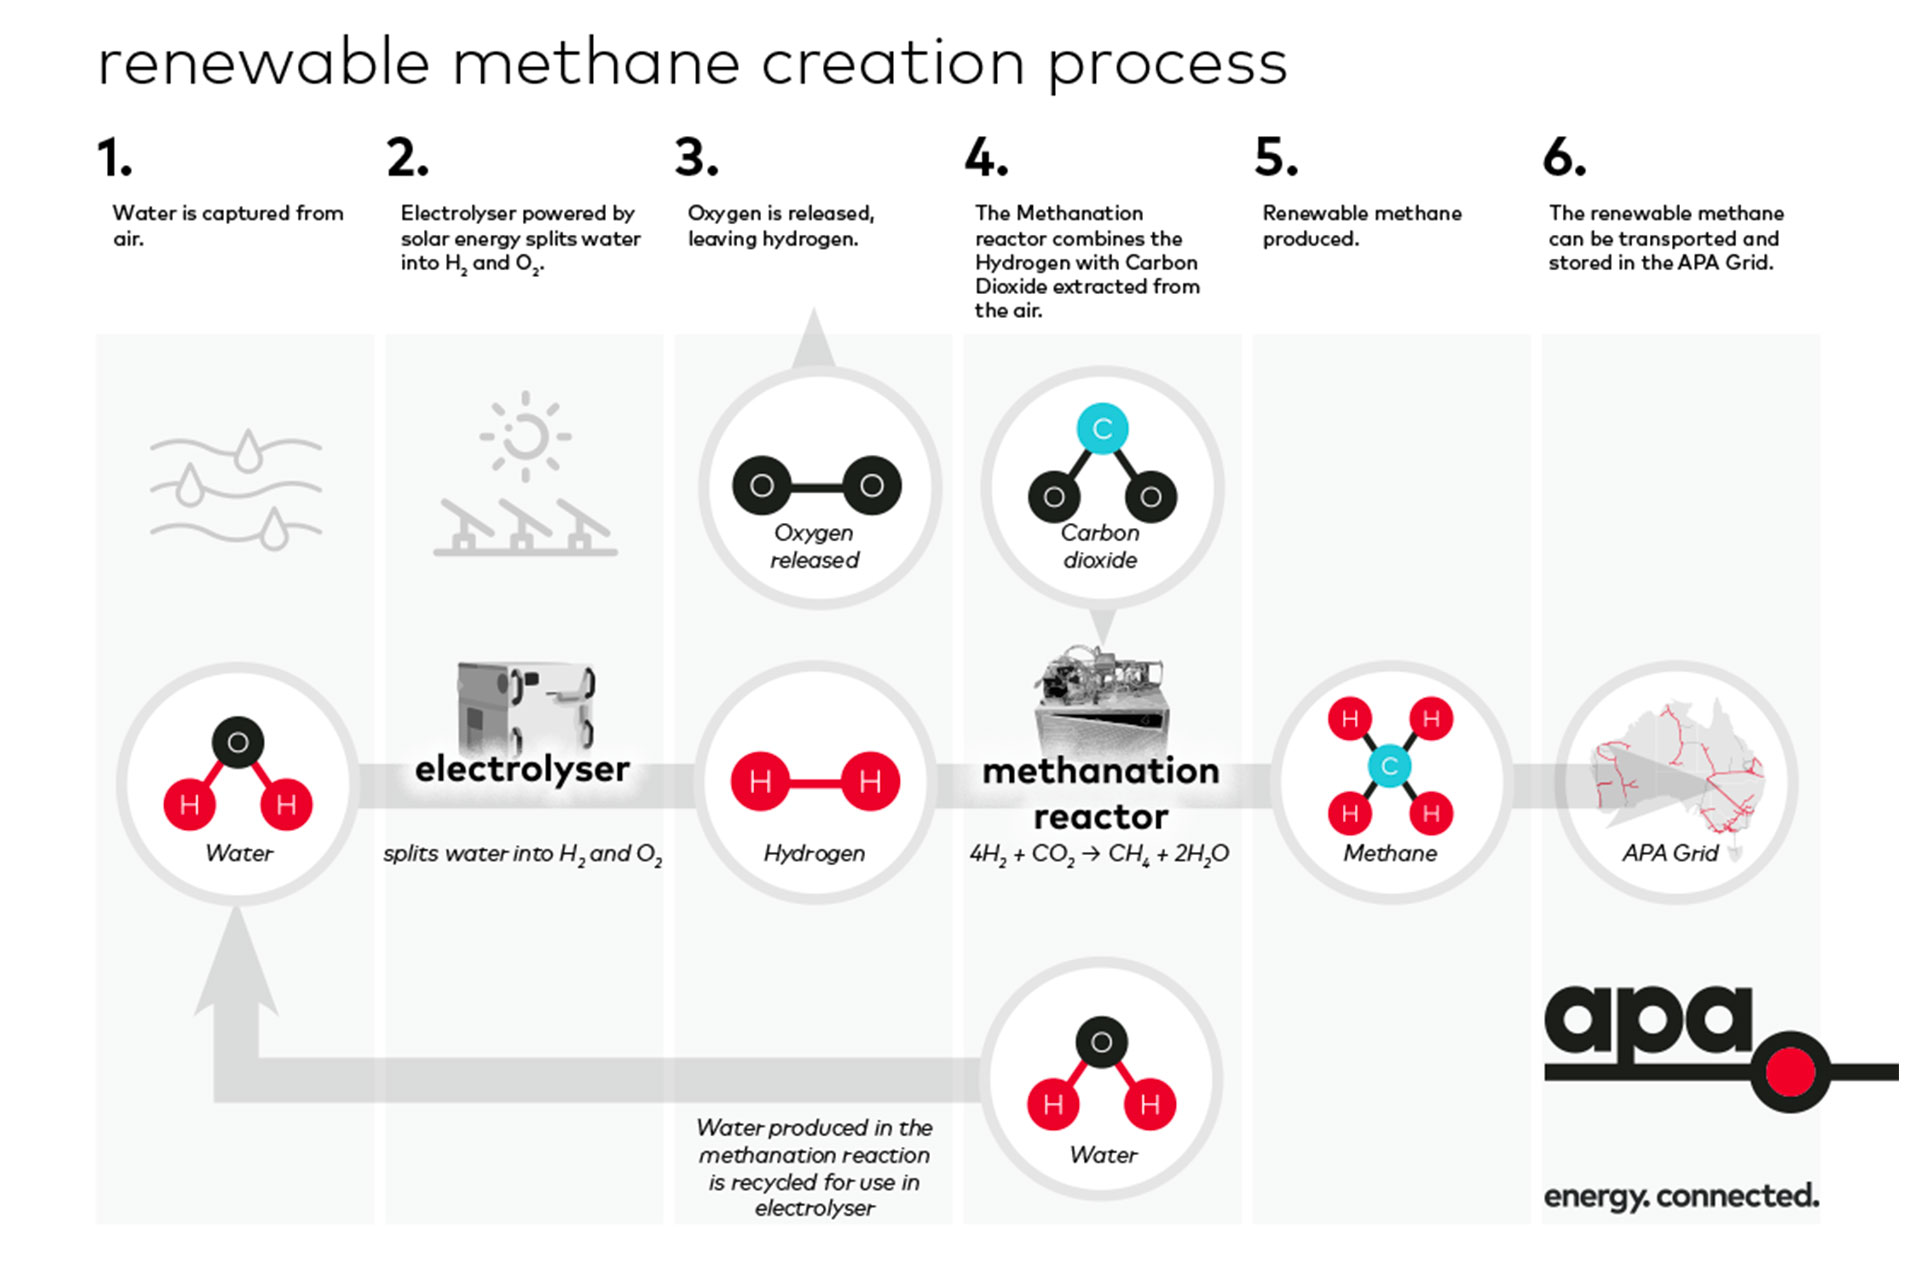 Image - Renewable methane creation process